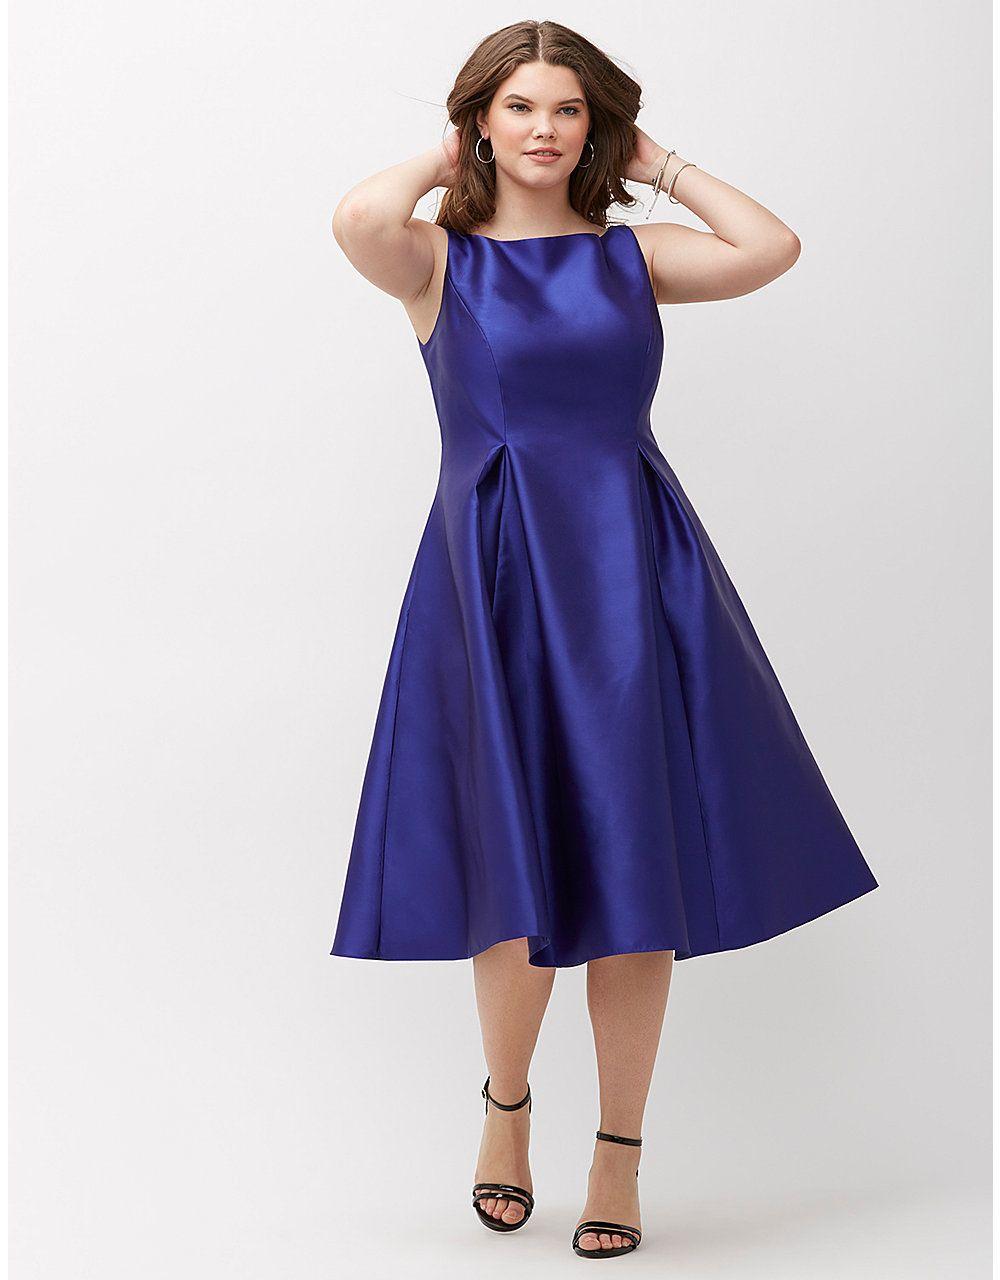 Satin midi dress by Adrianna Papell | Lane Bryant